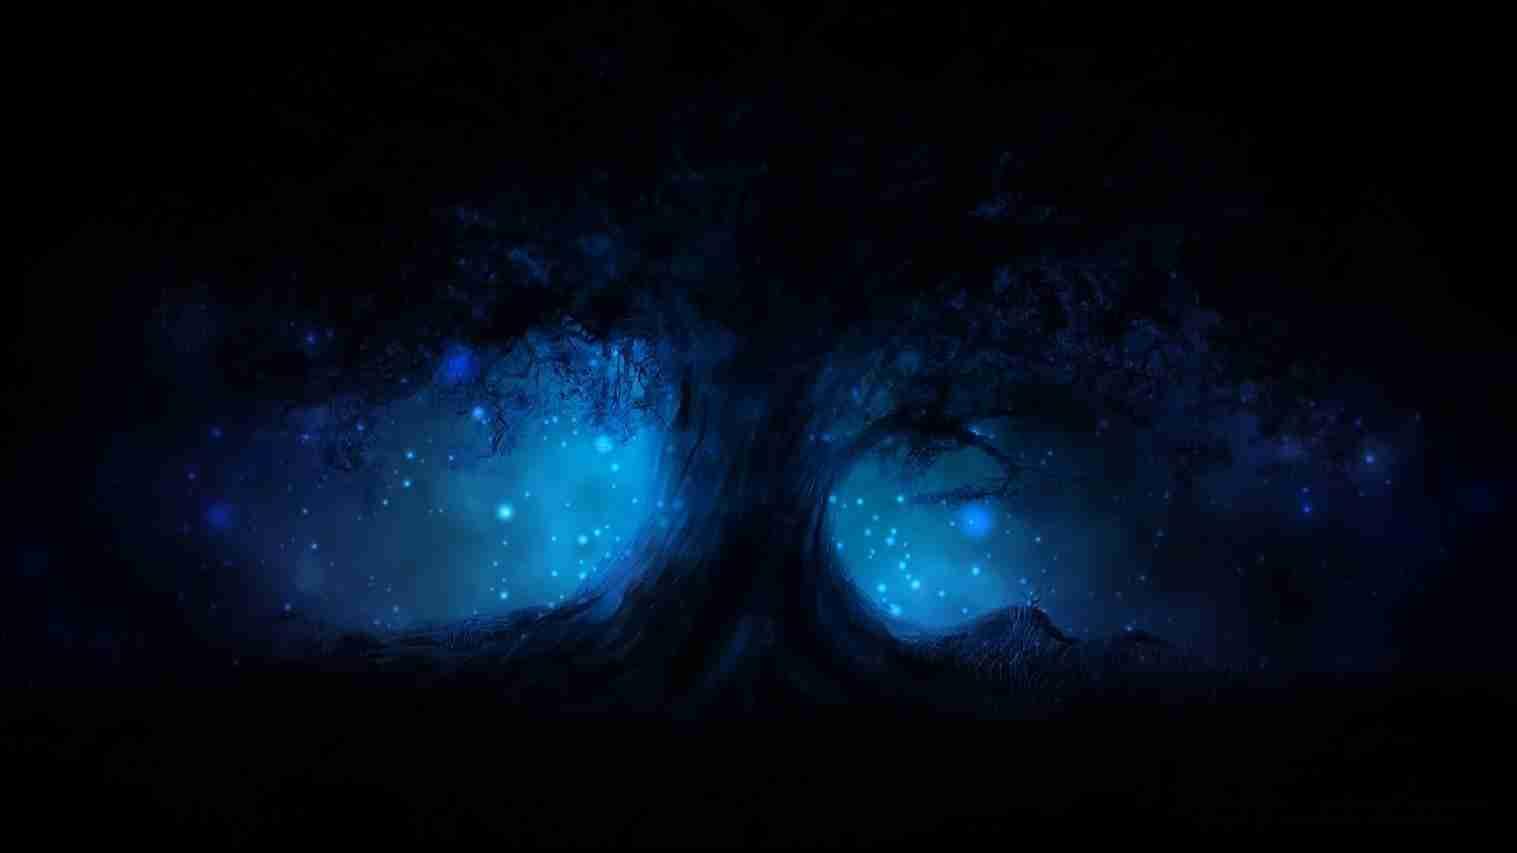 Black Aesthetic Wallpaper Blue Tree 54018 Hd